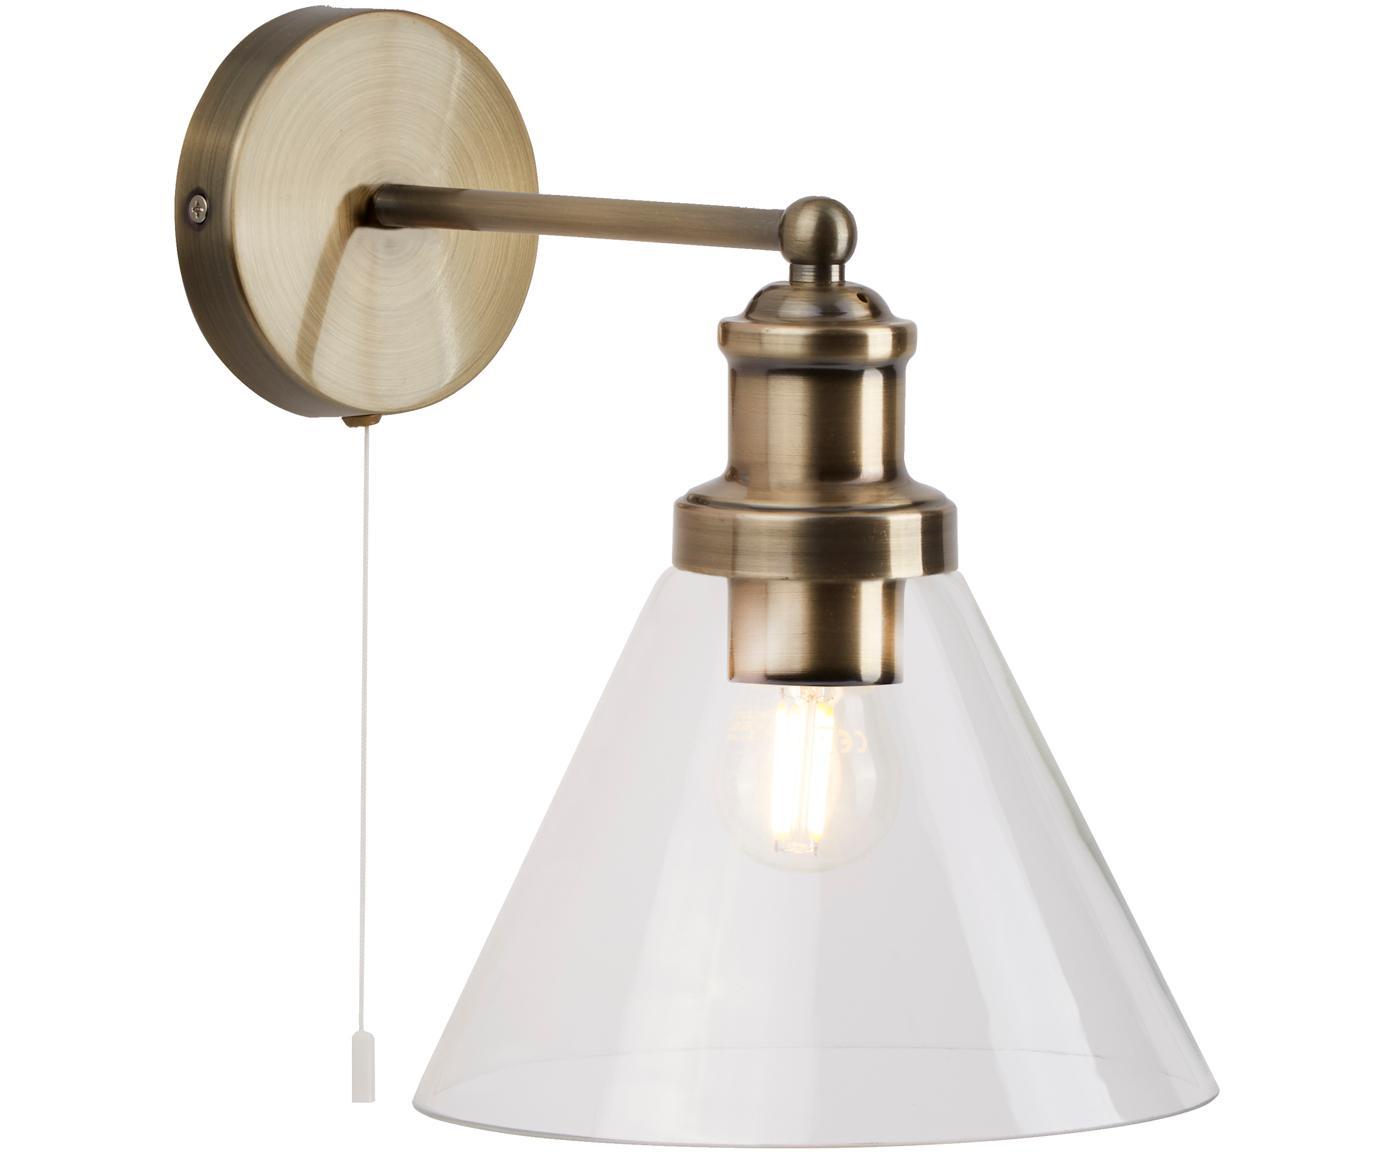 Wandlamp Pyramid, Lampenkap: glas, Messingkleurig, transparant, 19 x 25 cm